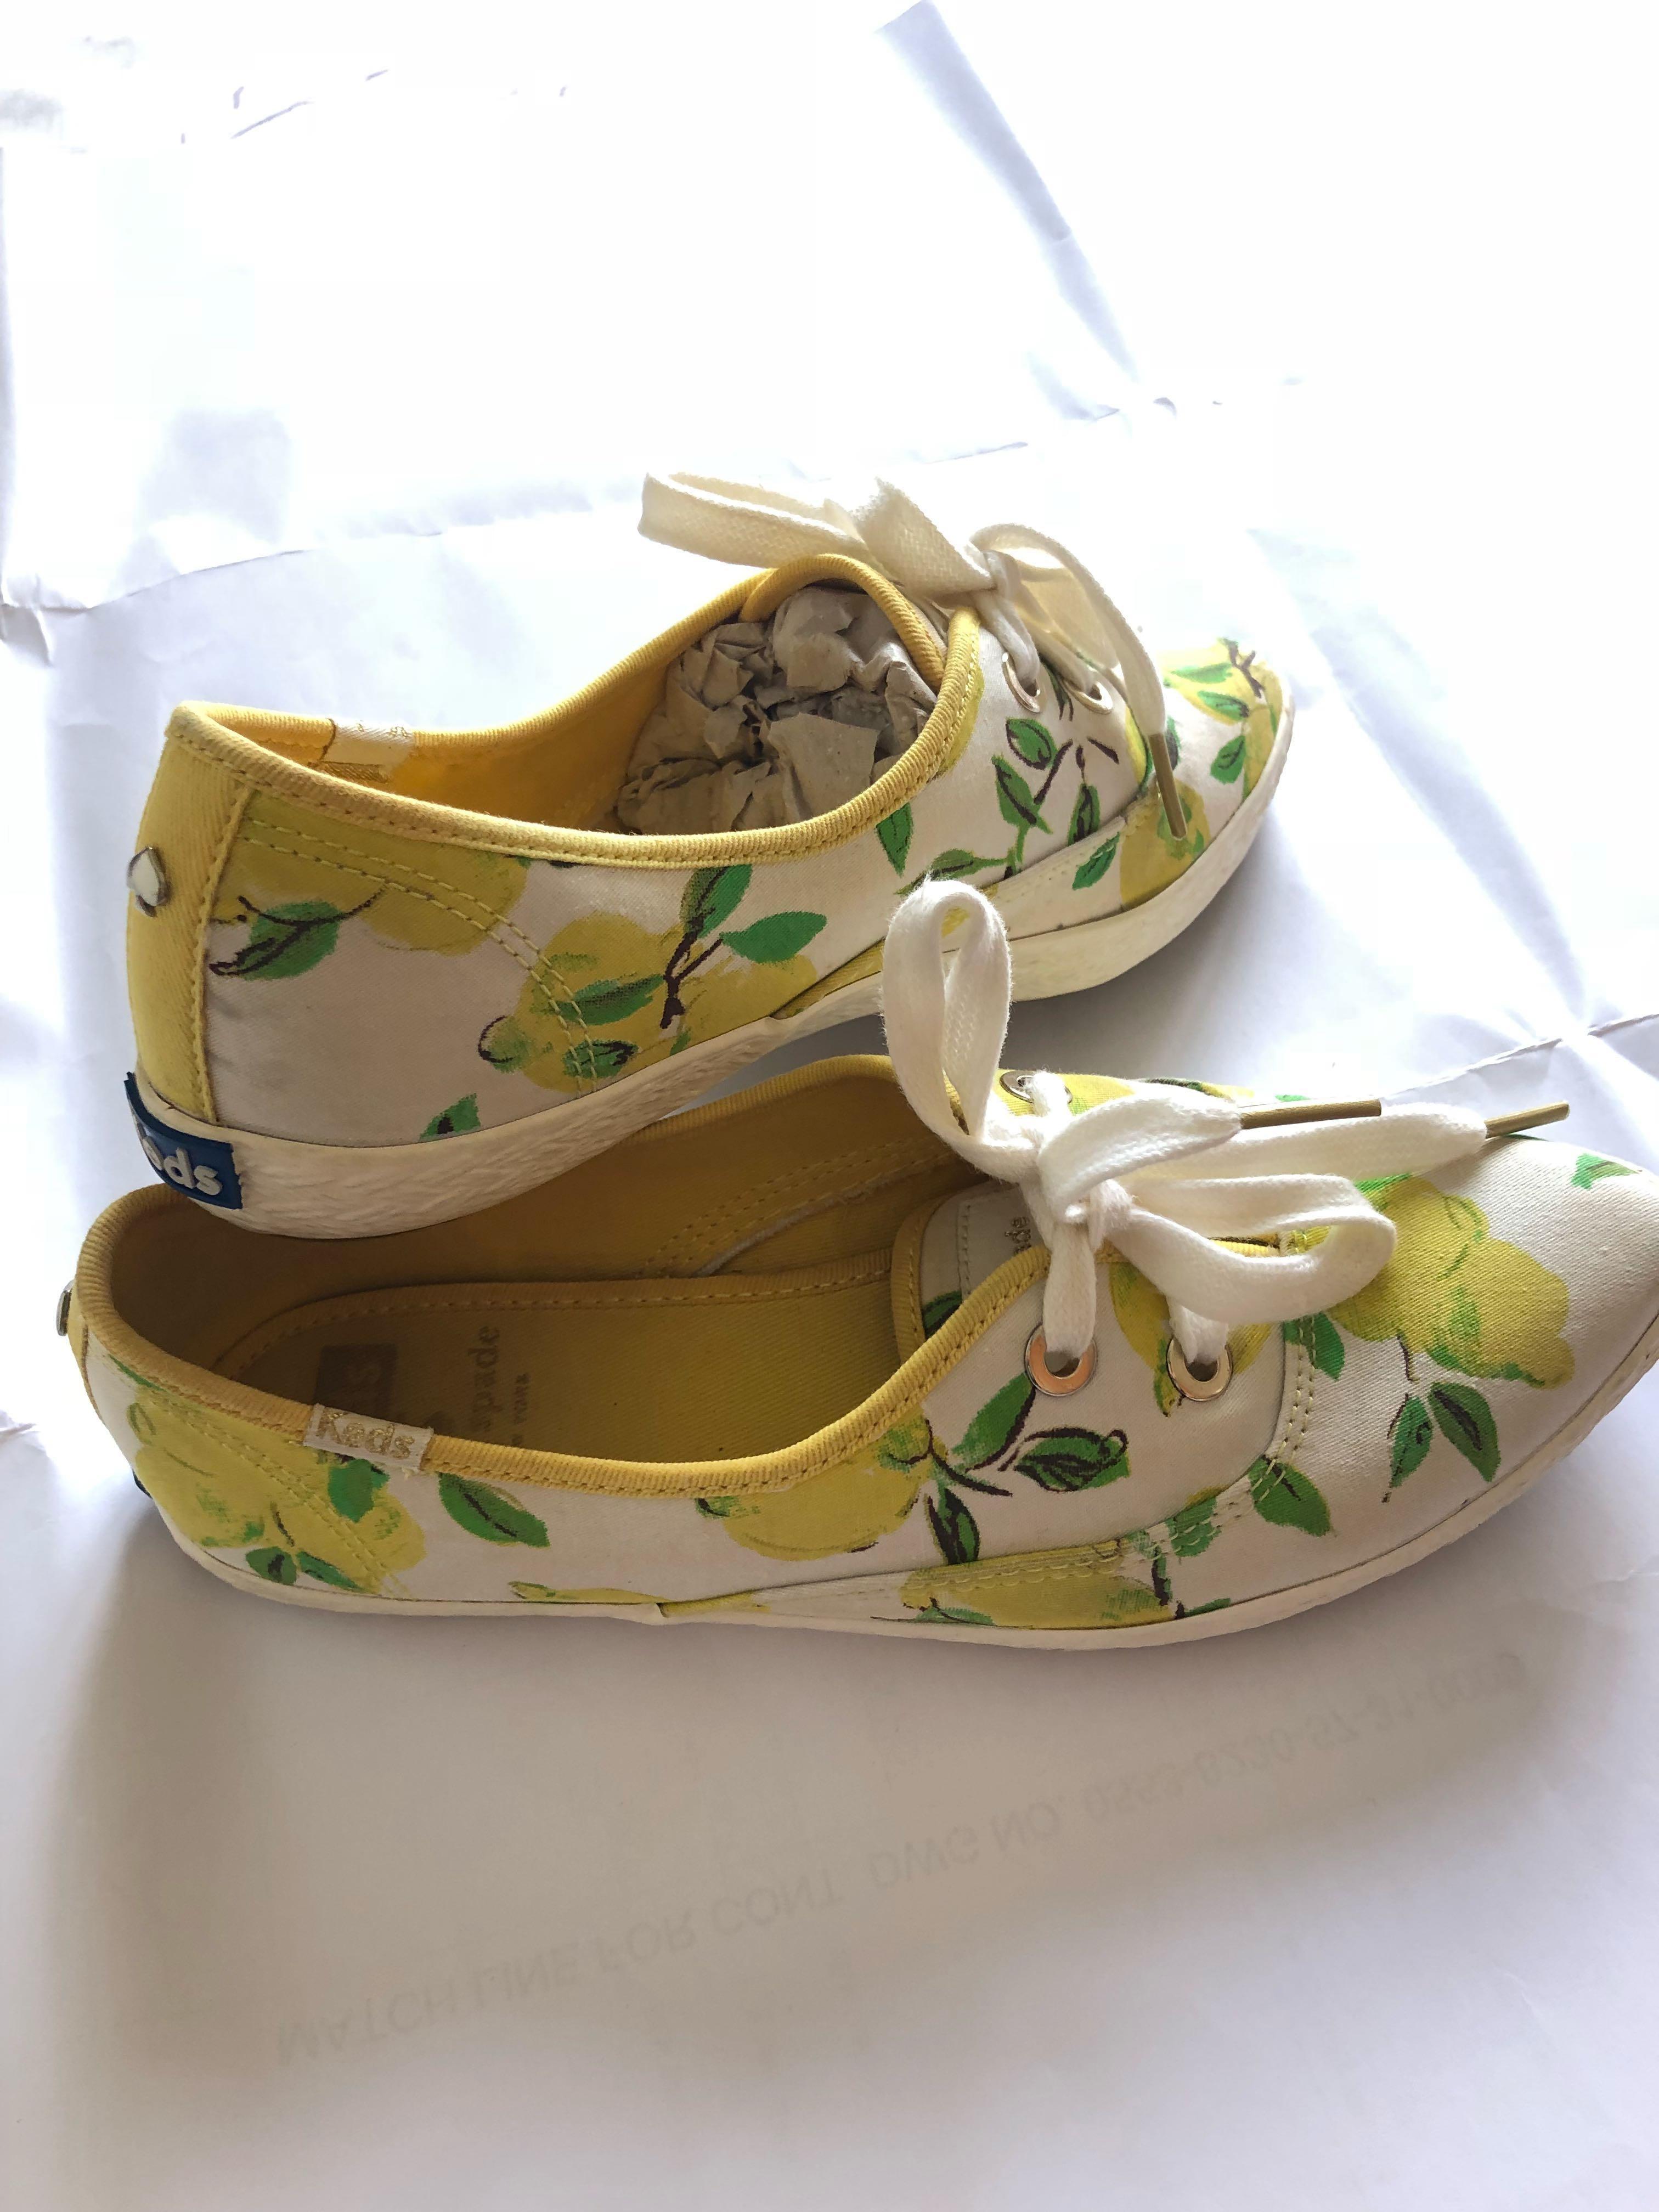 8ad9ffedb574 Pre-loved) Keds x Kate Spade Sneakers